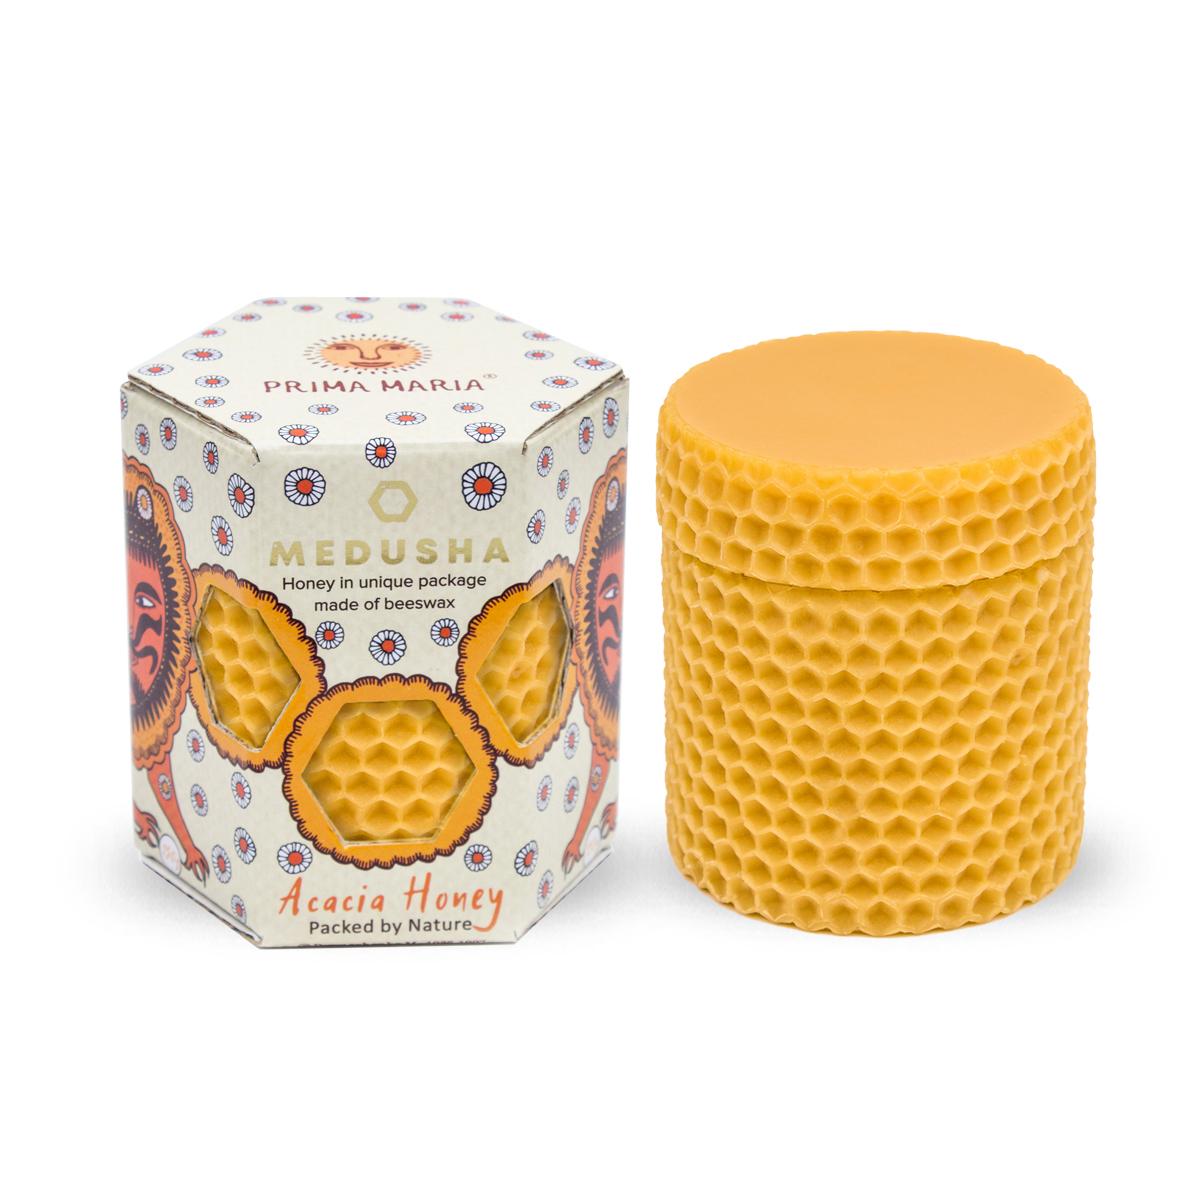 Beehive 150g Prima Maria